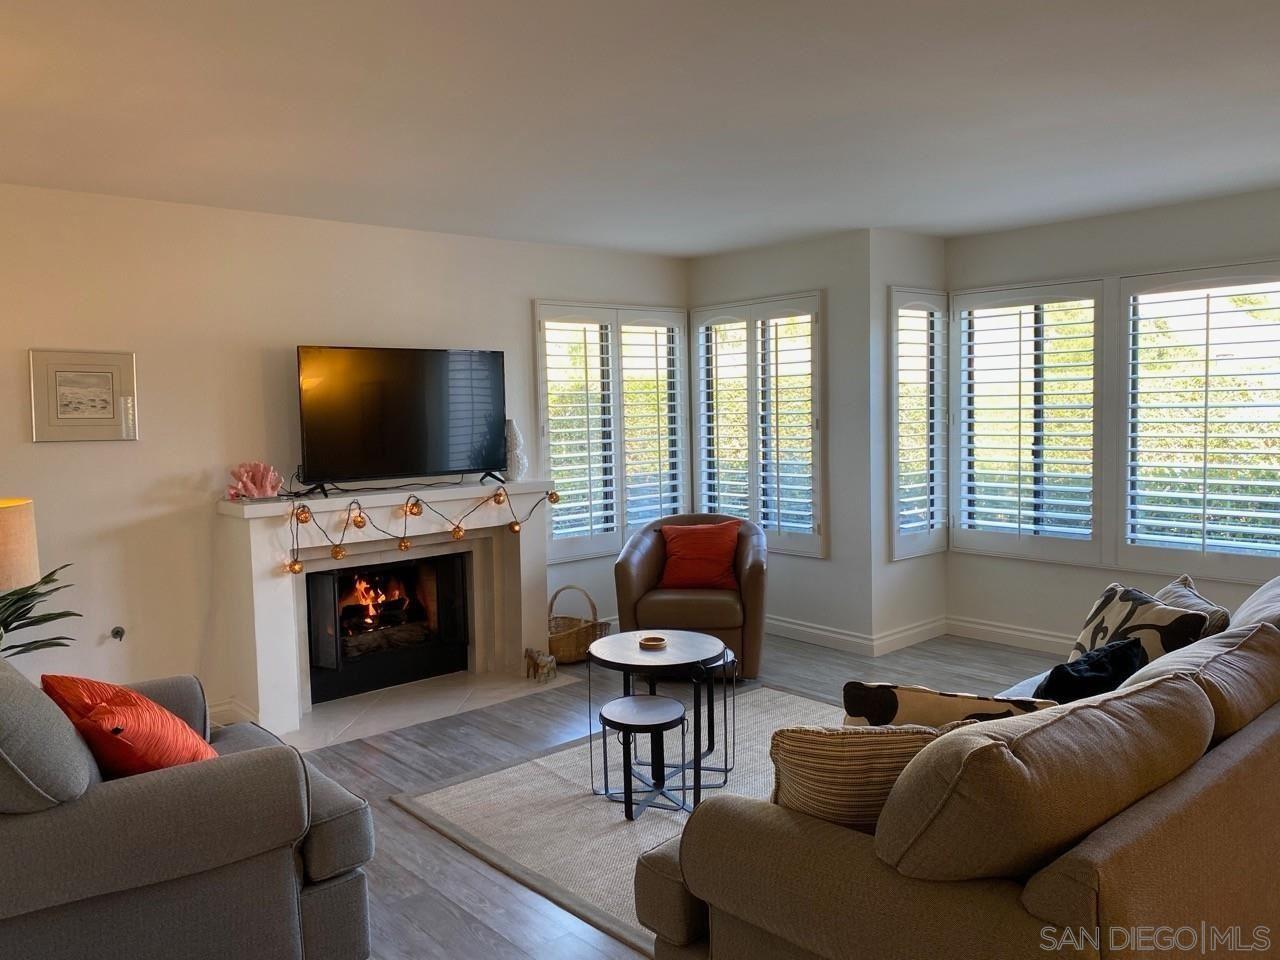 Photo of 524 Via de la Valle #J, Solana Beach, CA 92075 (MLS # 210021705)